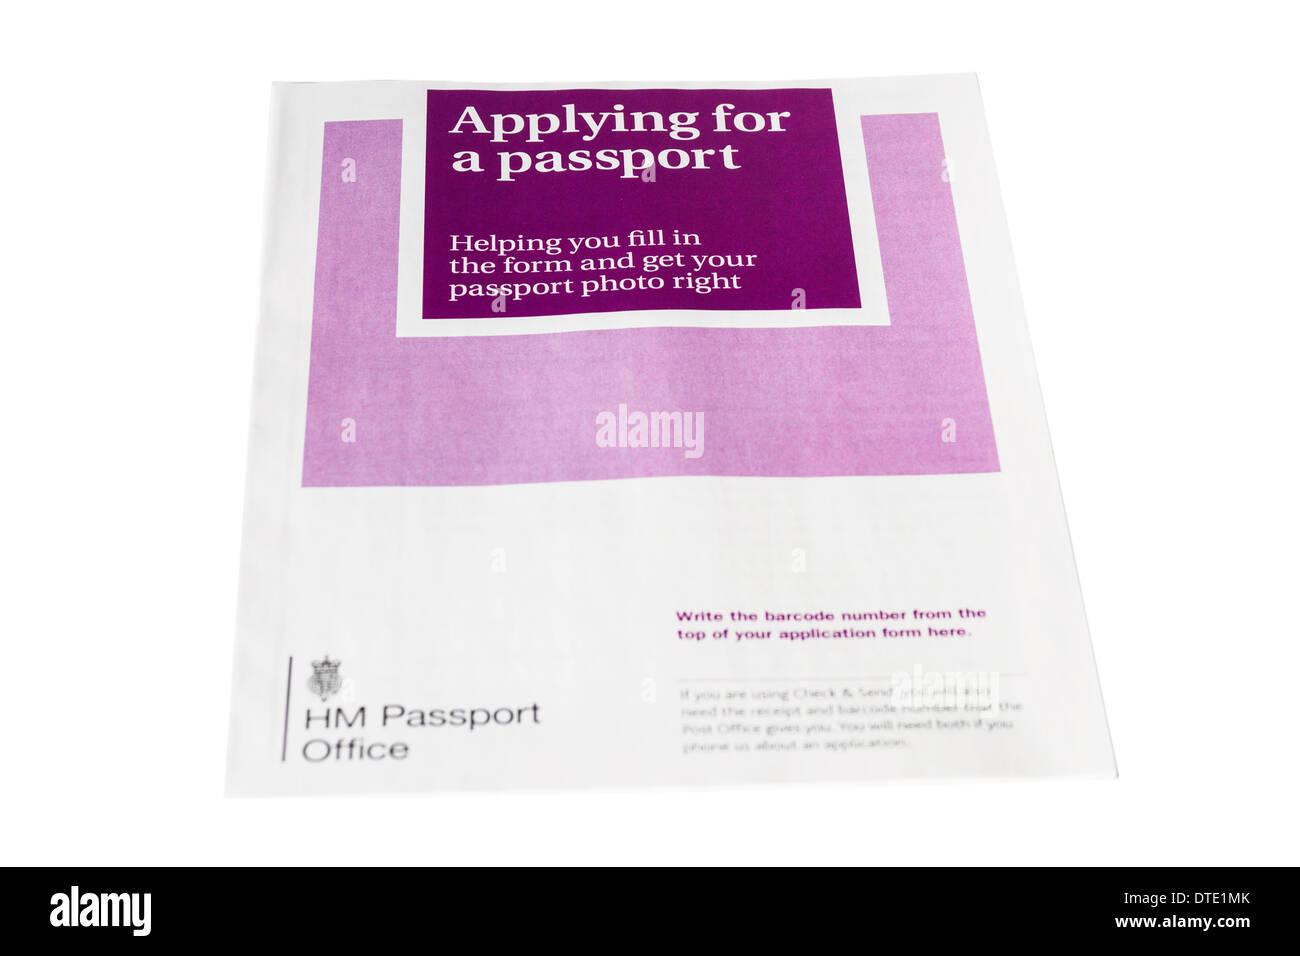 UK passport application form - Stock Image